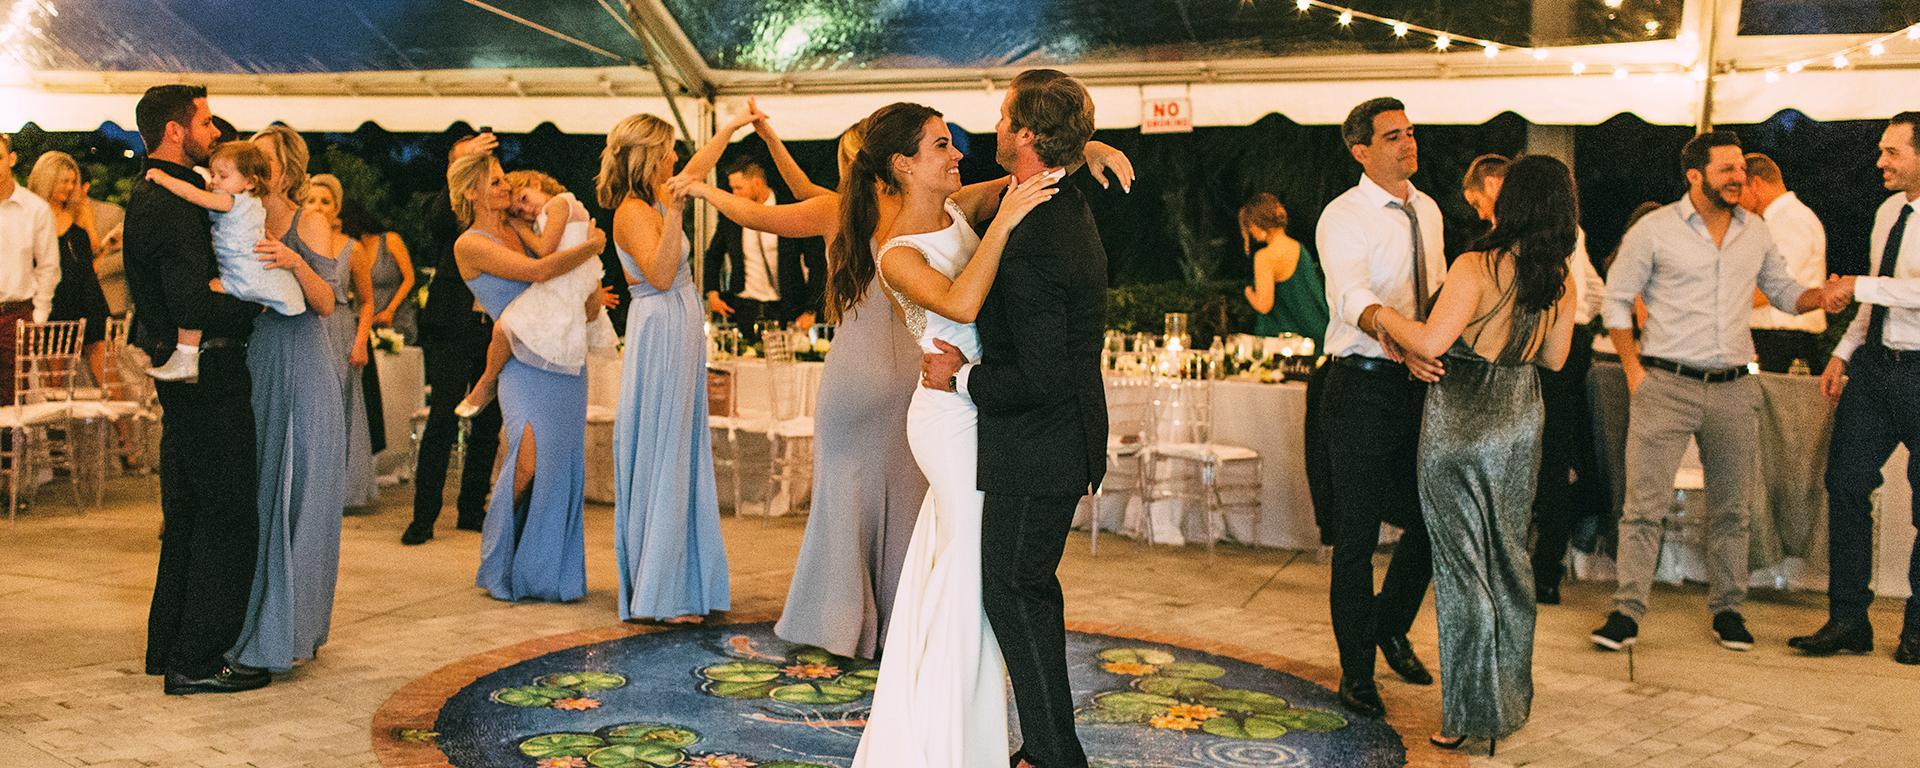 Wedding attendees dancing